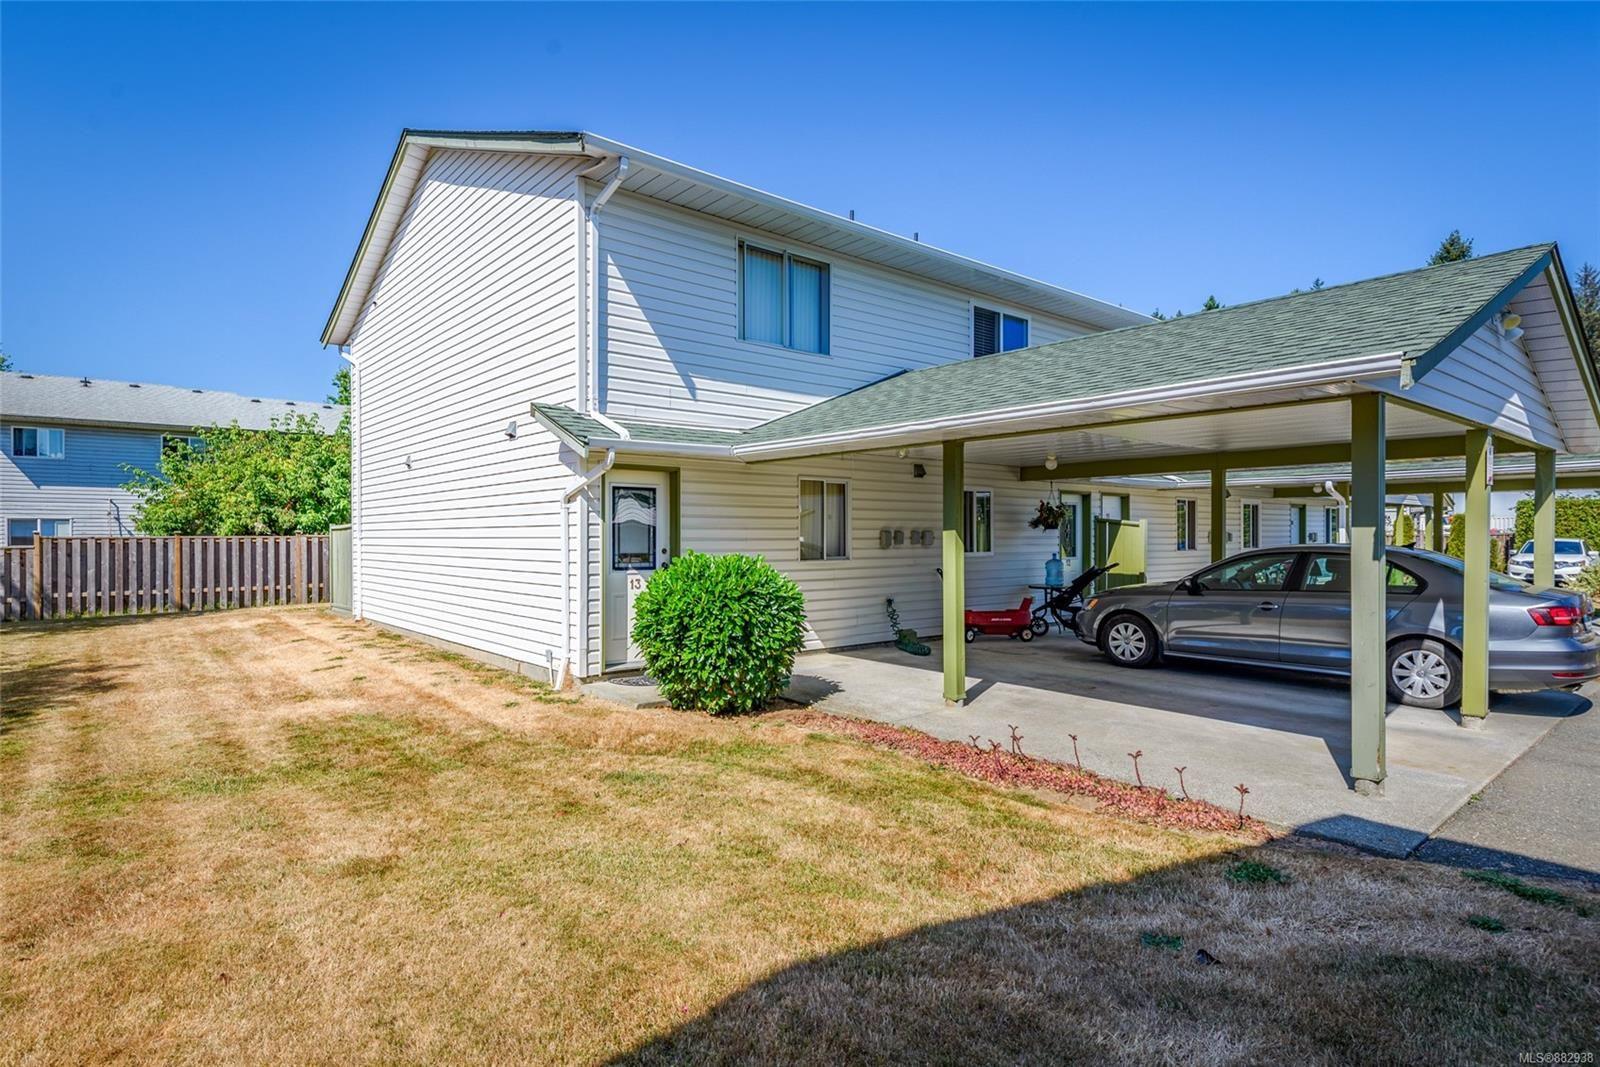 Main Photo: 13 1095 Edgett Rd in : CV Courtenay City Condo for sale (Comox Valley)  : MLS®# 882938